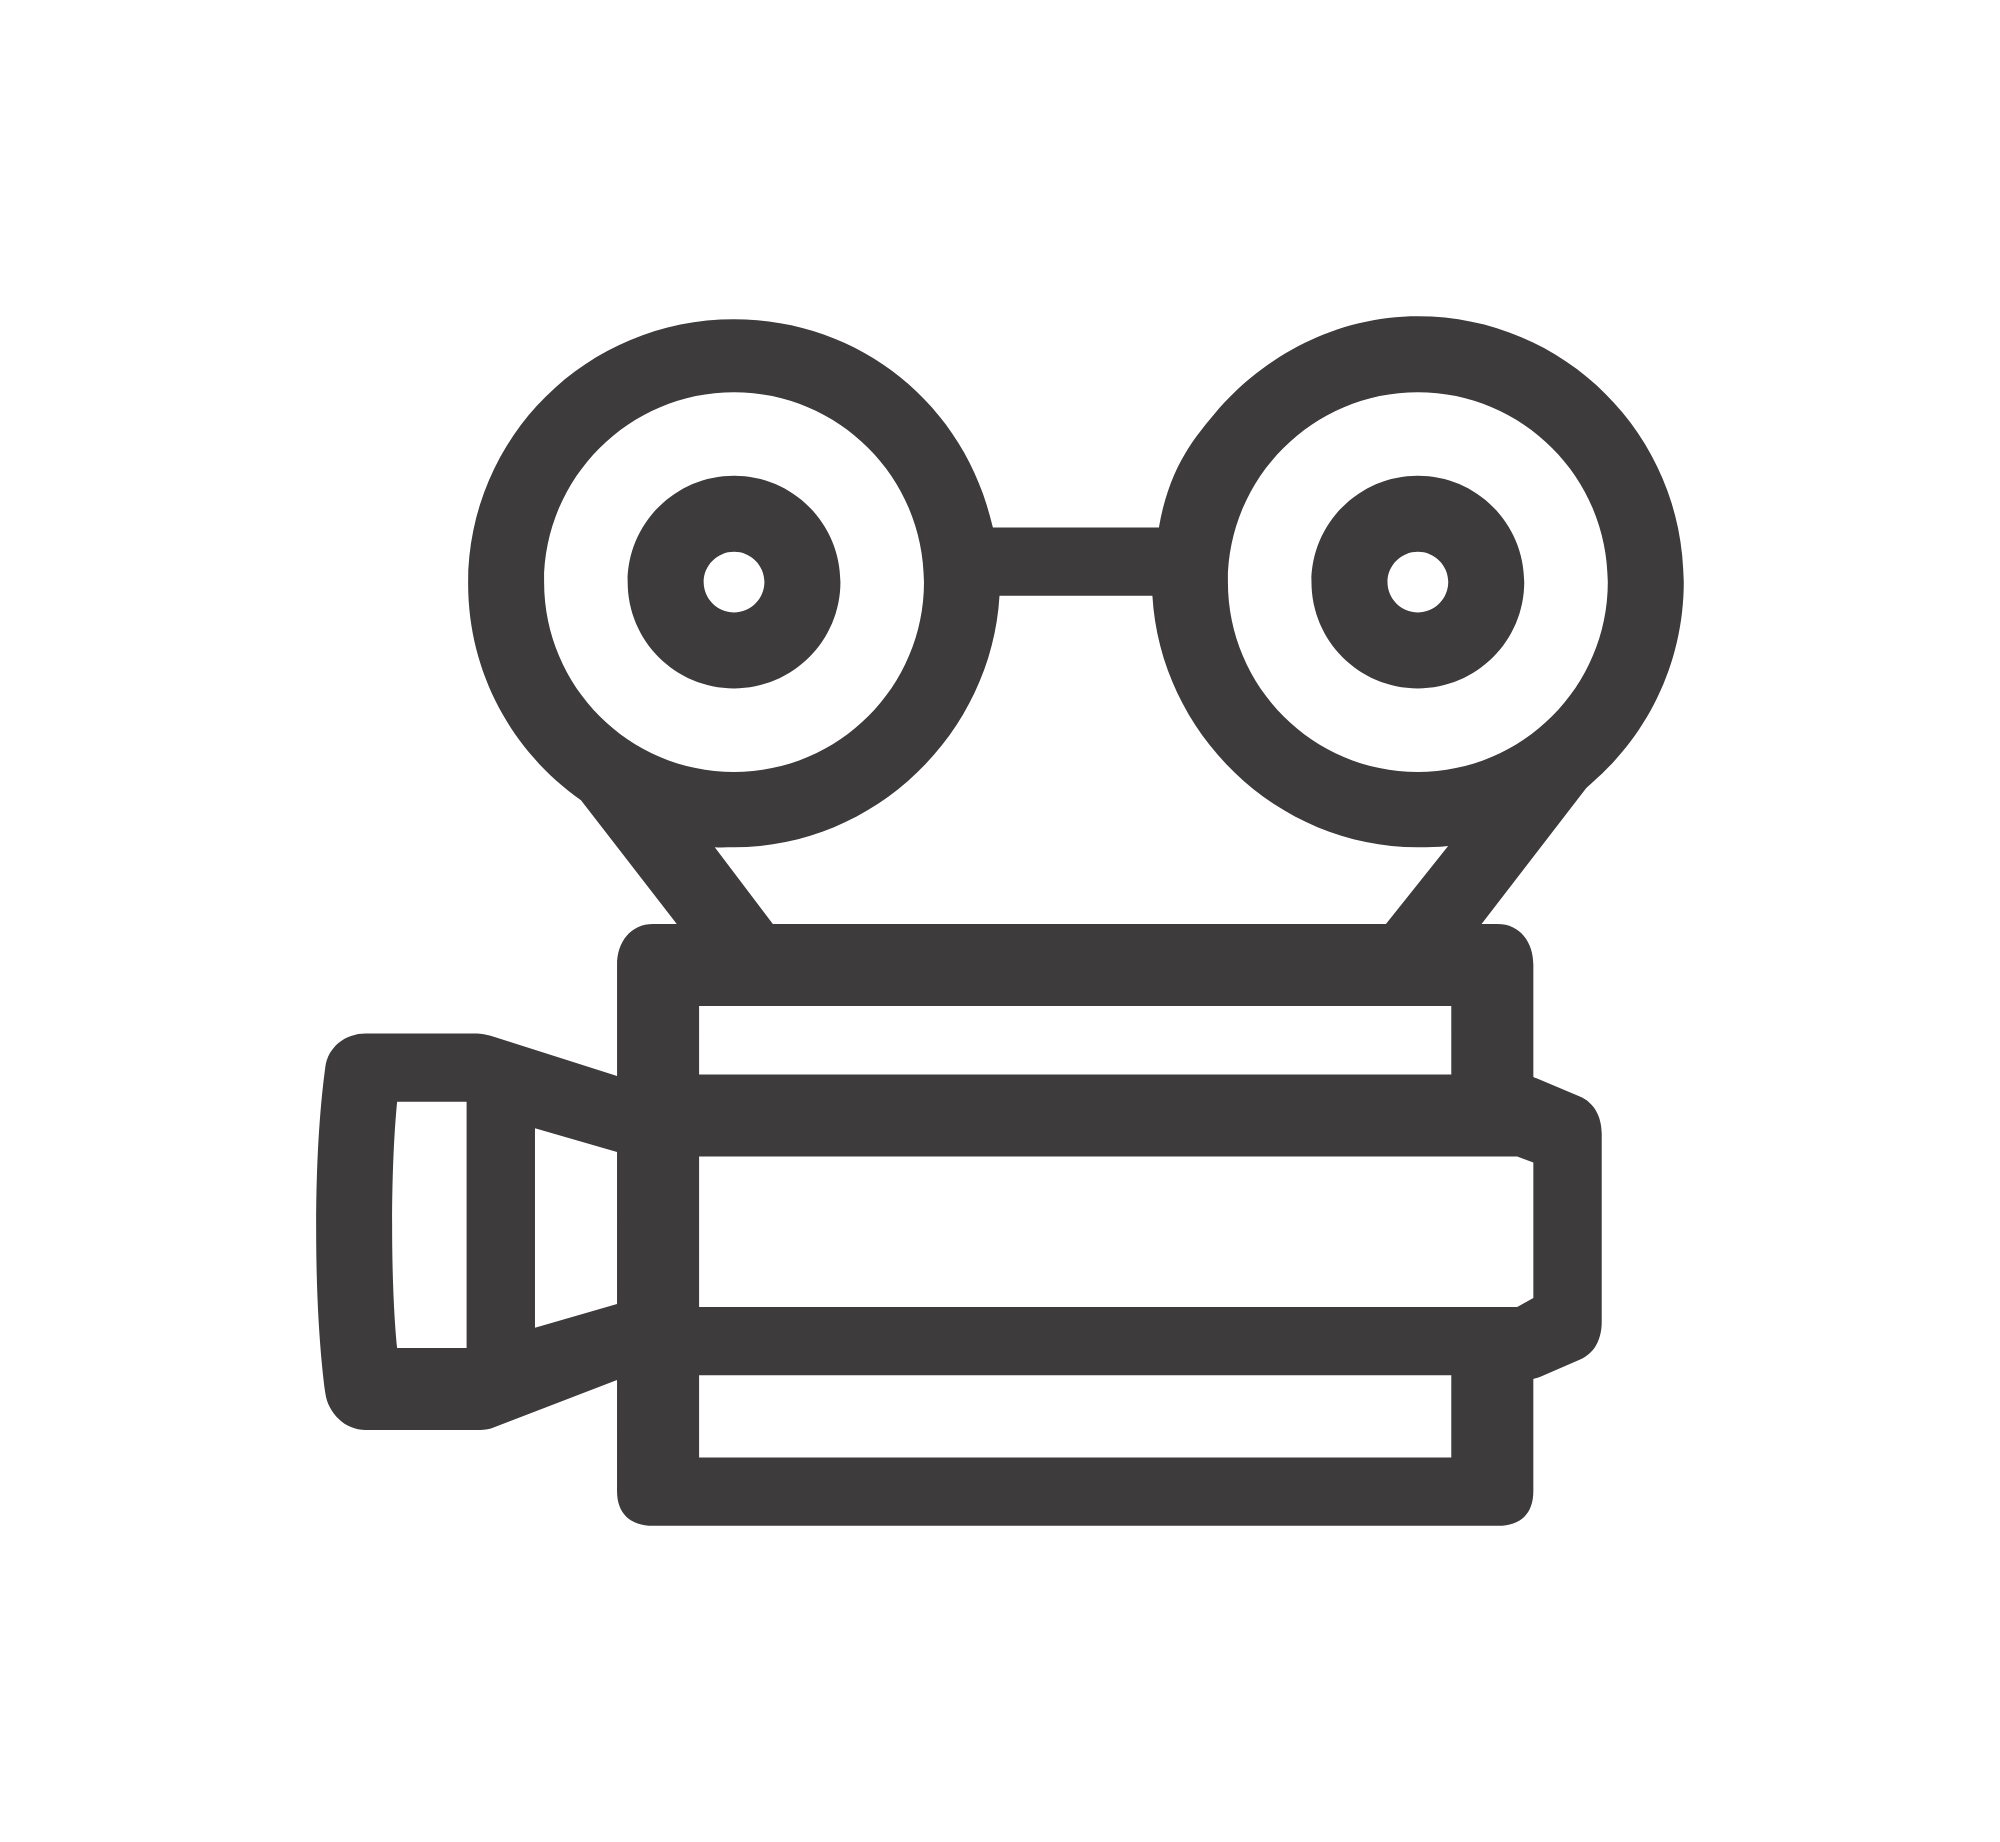 bausmedia-photo-and-video-production-icon